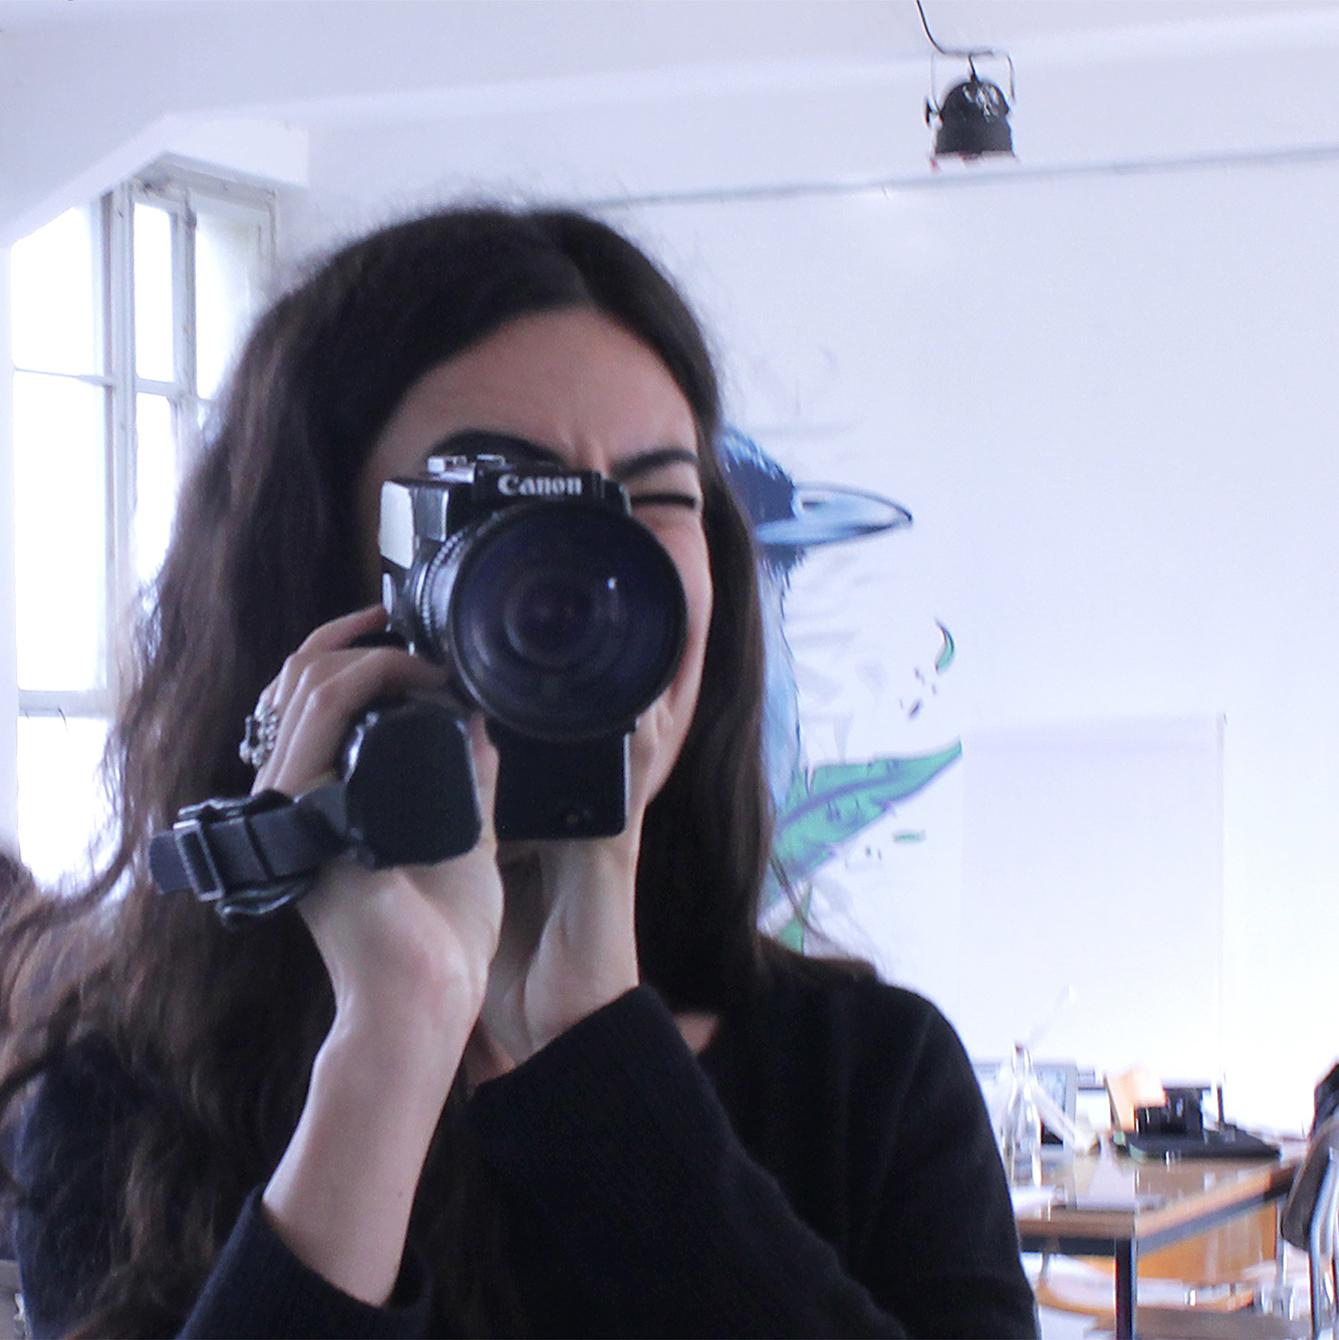 Filmmaker in Super 8